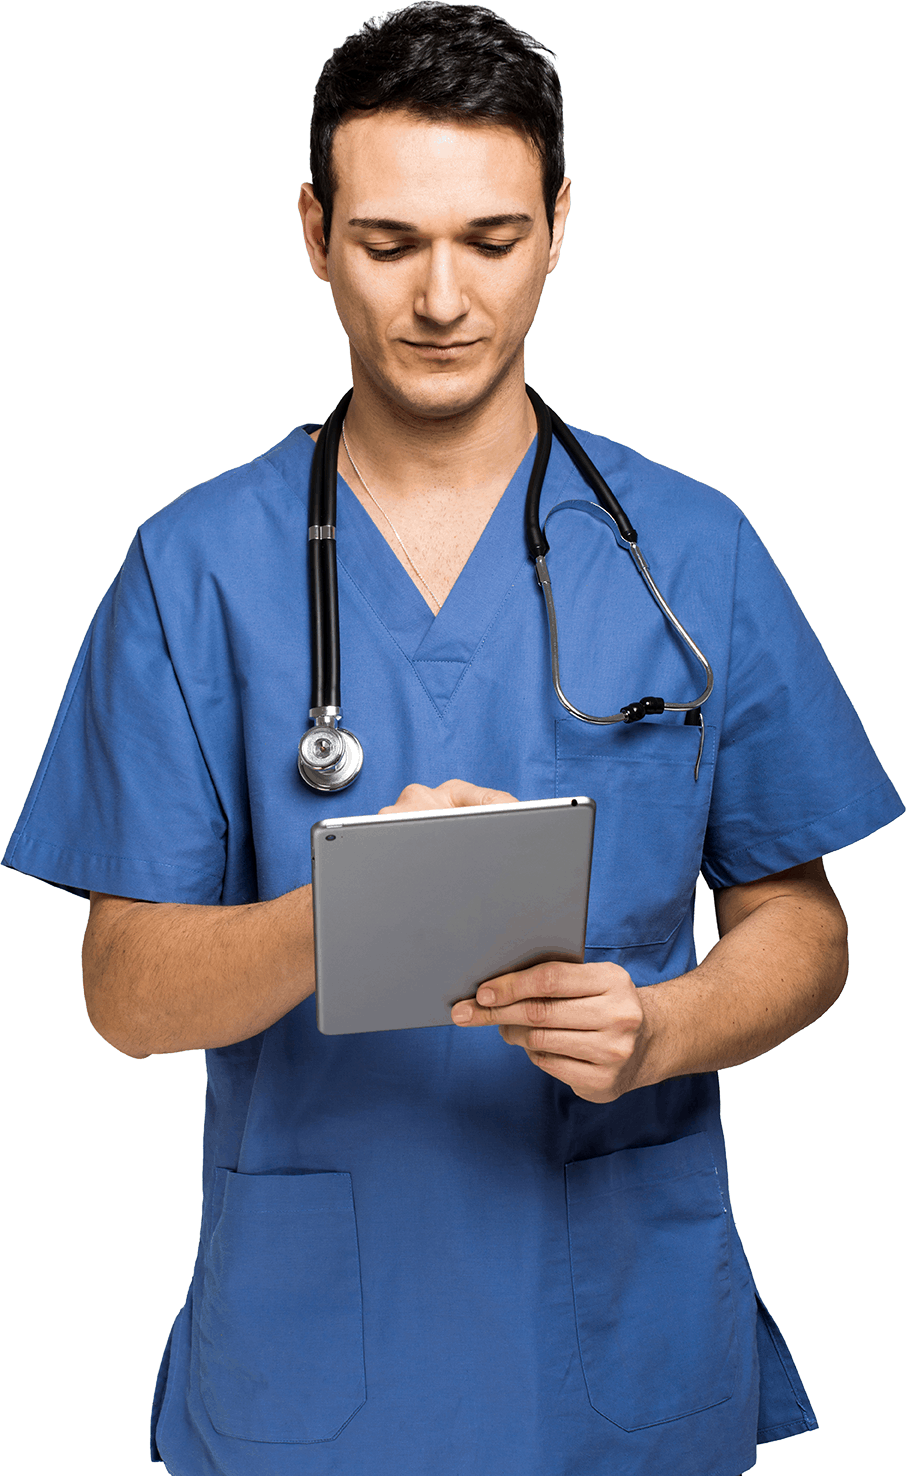 male nurse with tablet no BG